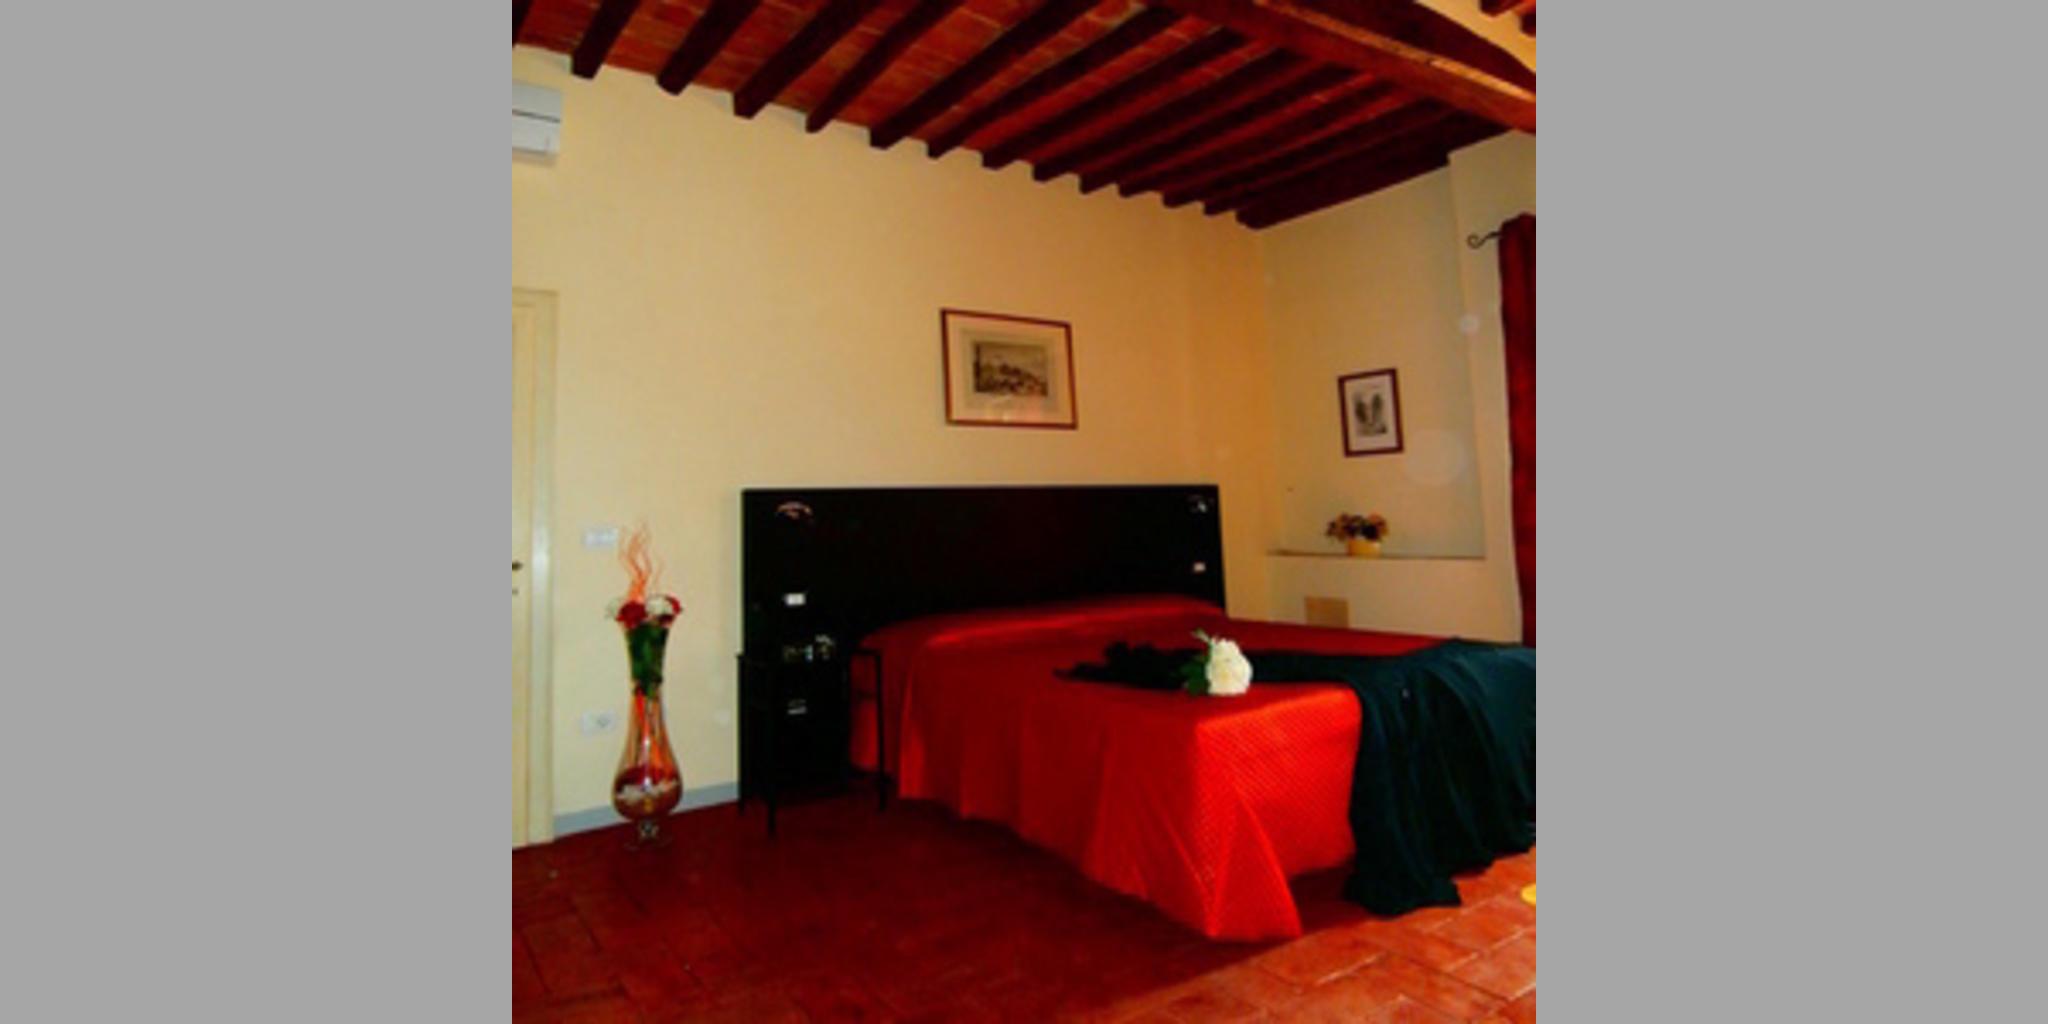 Bed & Breakfast Cascina - San Frediano A Settimo